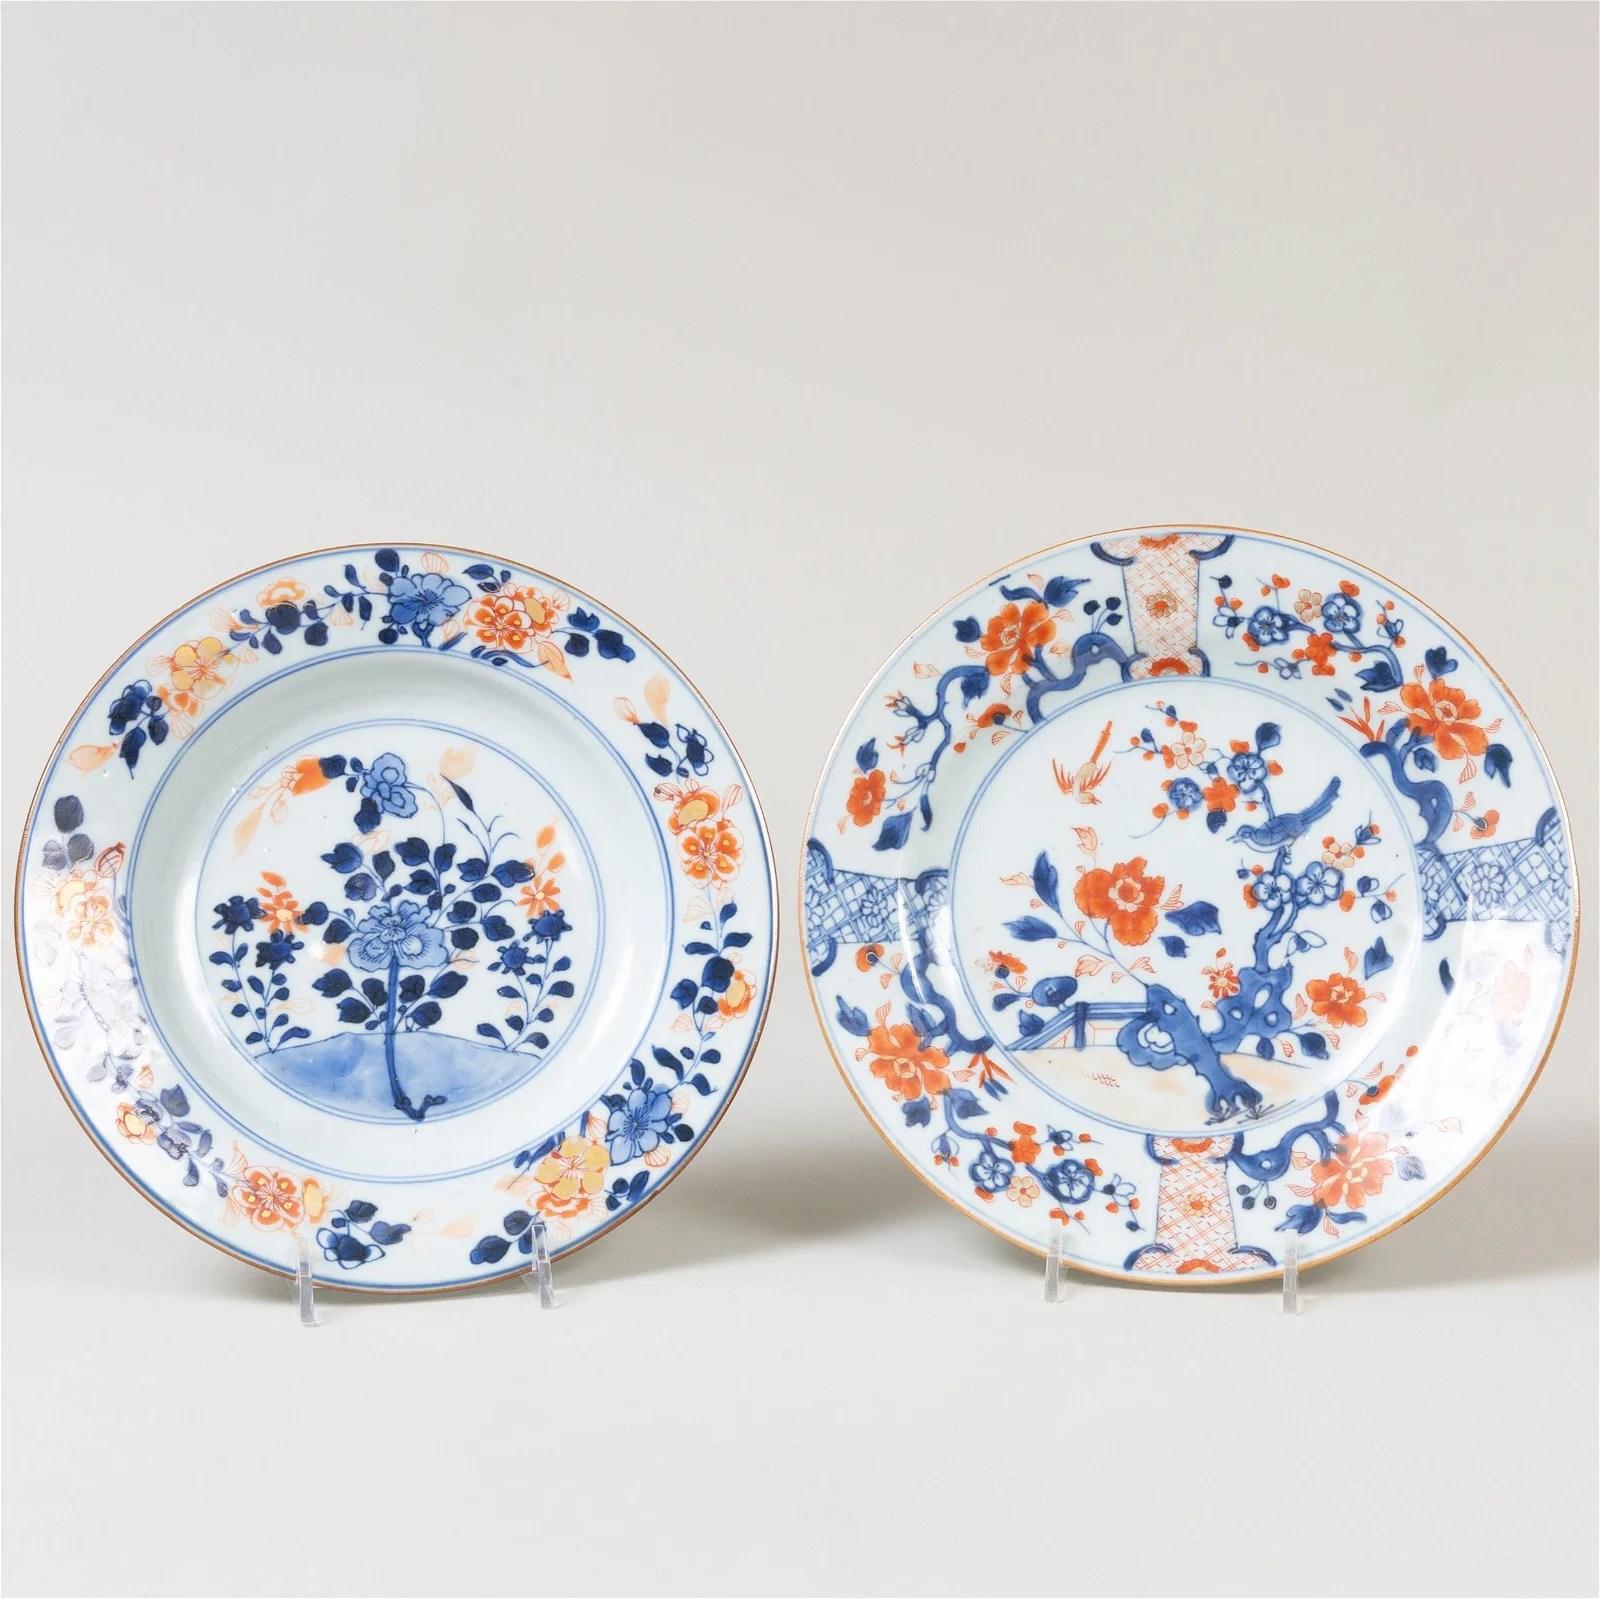 Two Chinese Export Imari Porcelain Plates